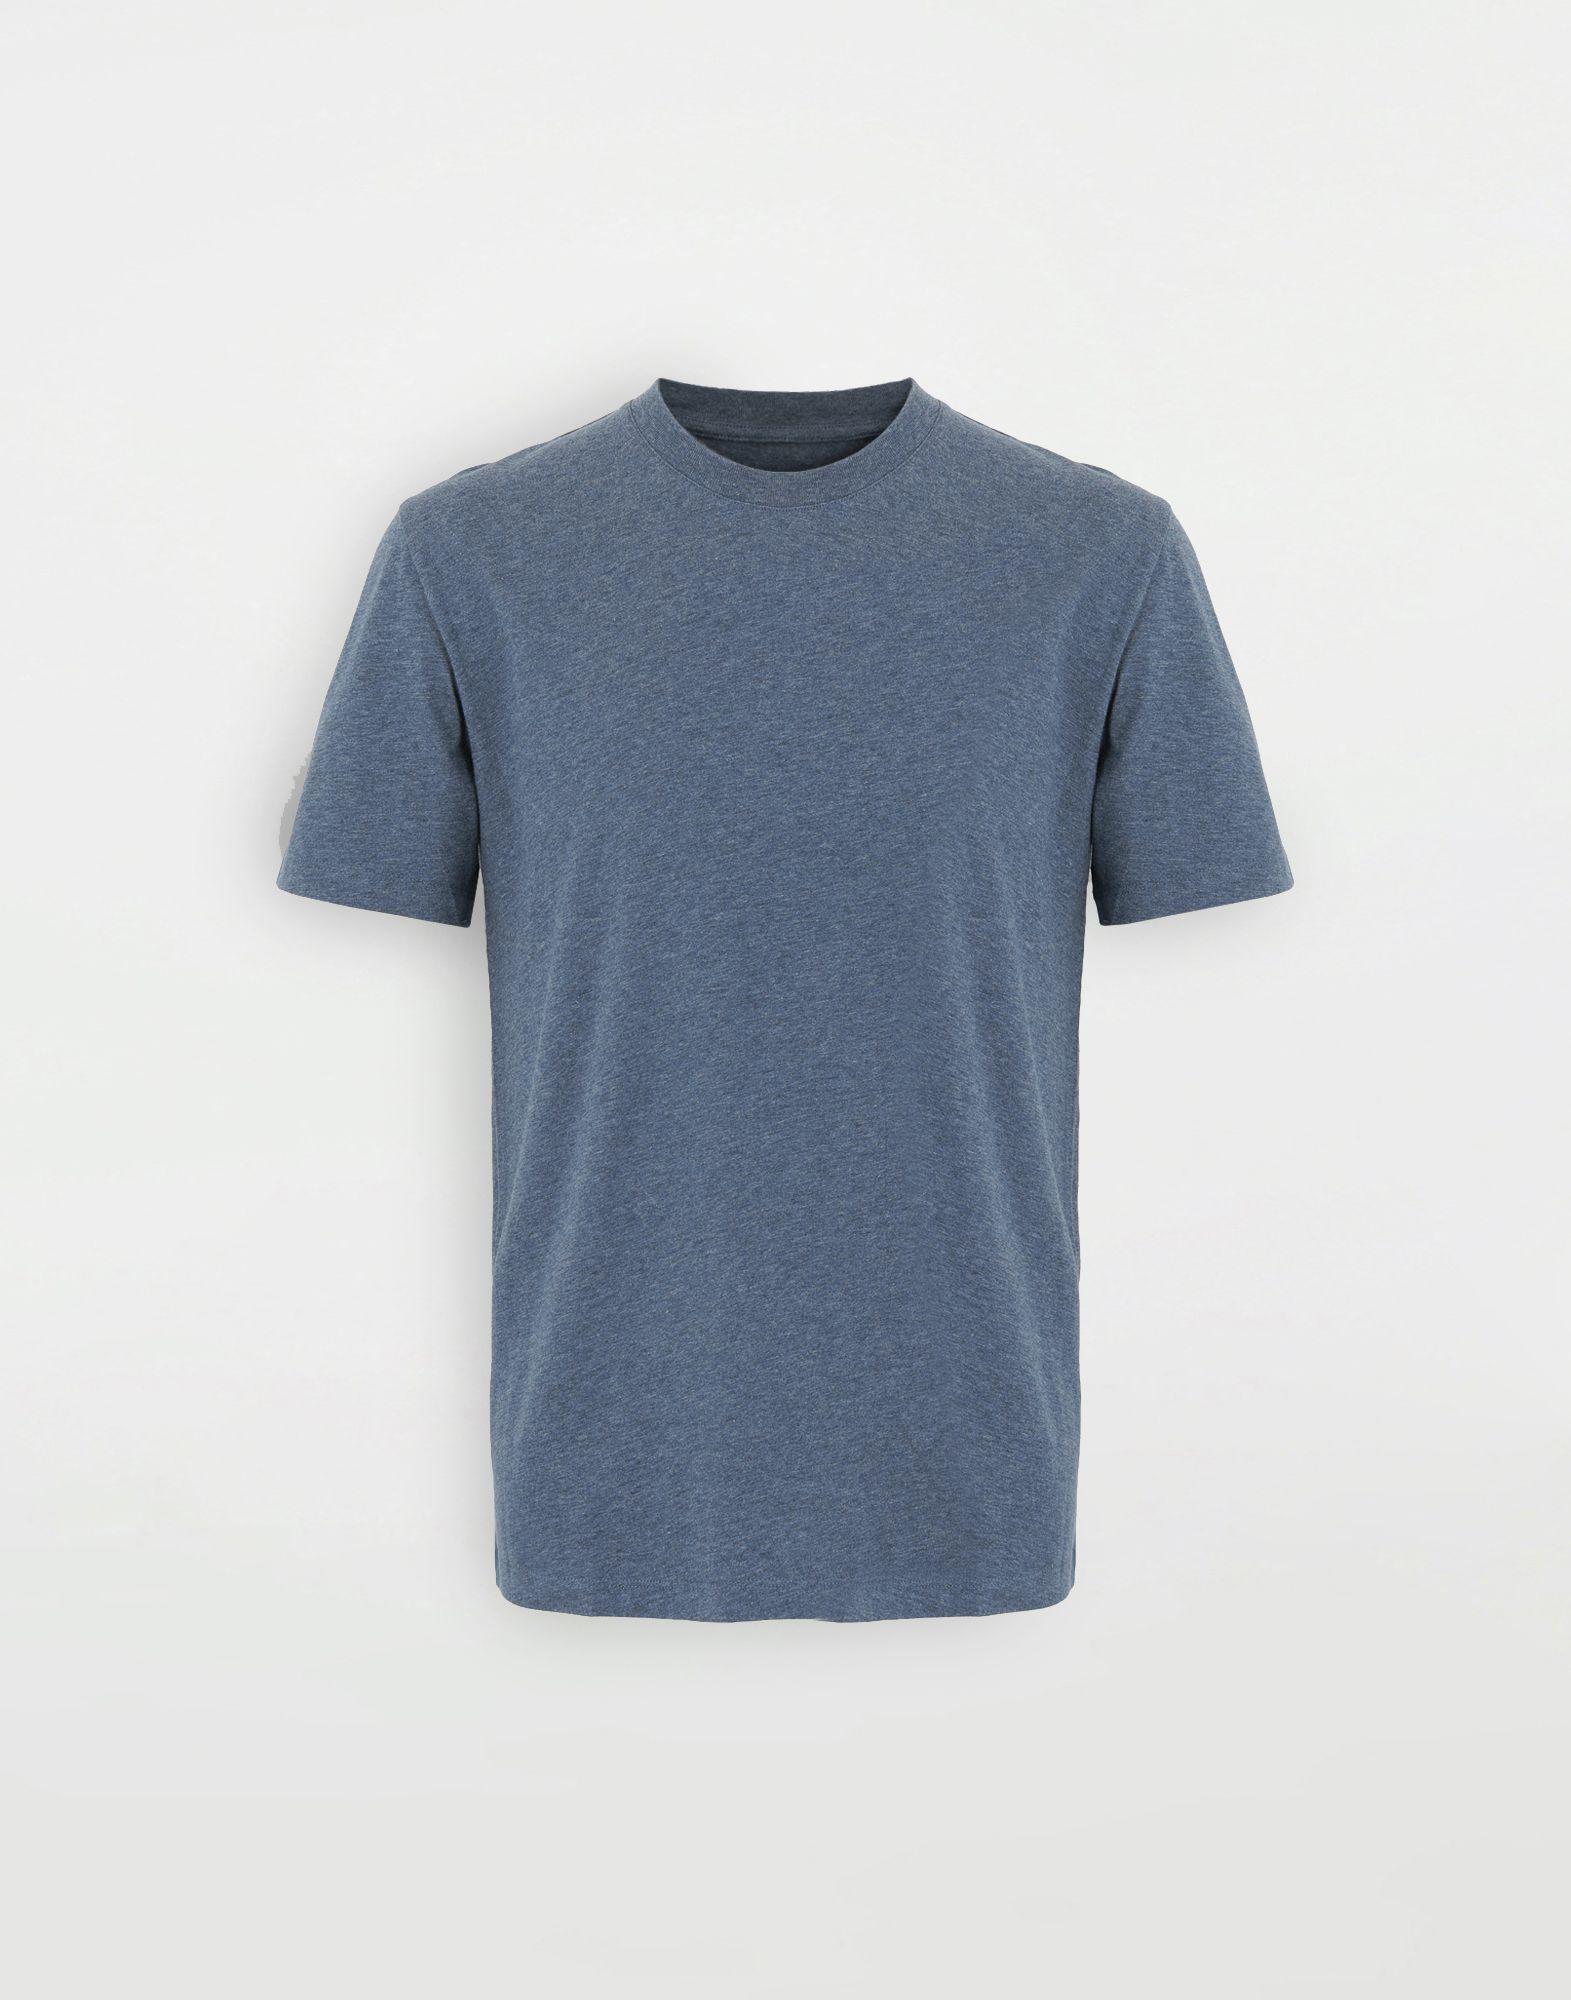 MAISON MARGIELA 3er Pack T-Shirts Stereotype Kurzärmliges T-Shirt Herren f